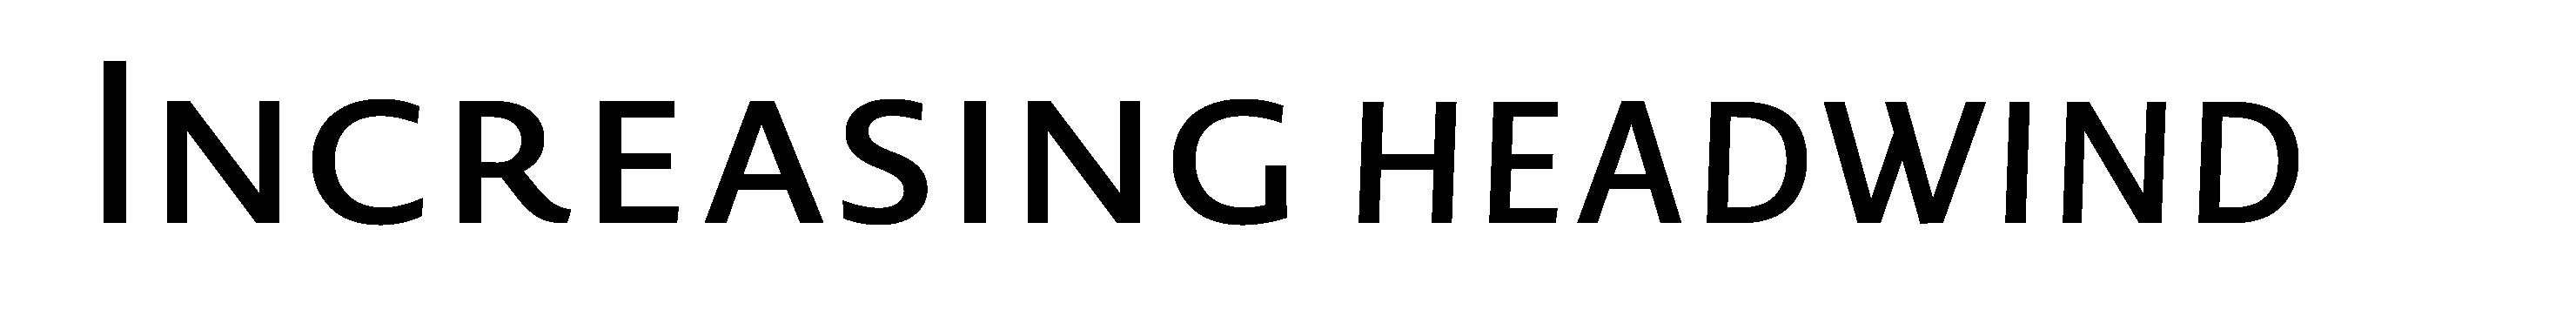 Typeface Novel Sans D09 Atlas Font Foundry